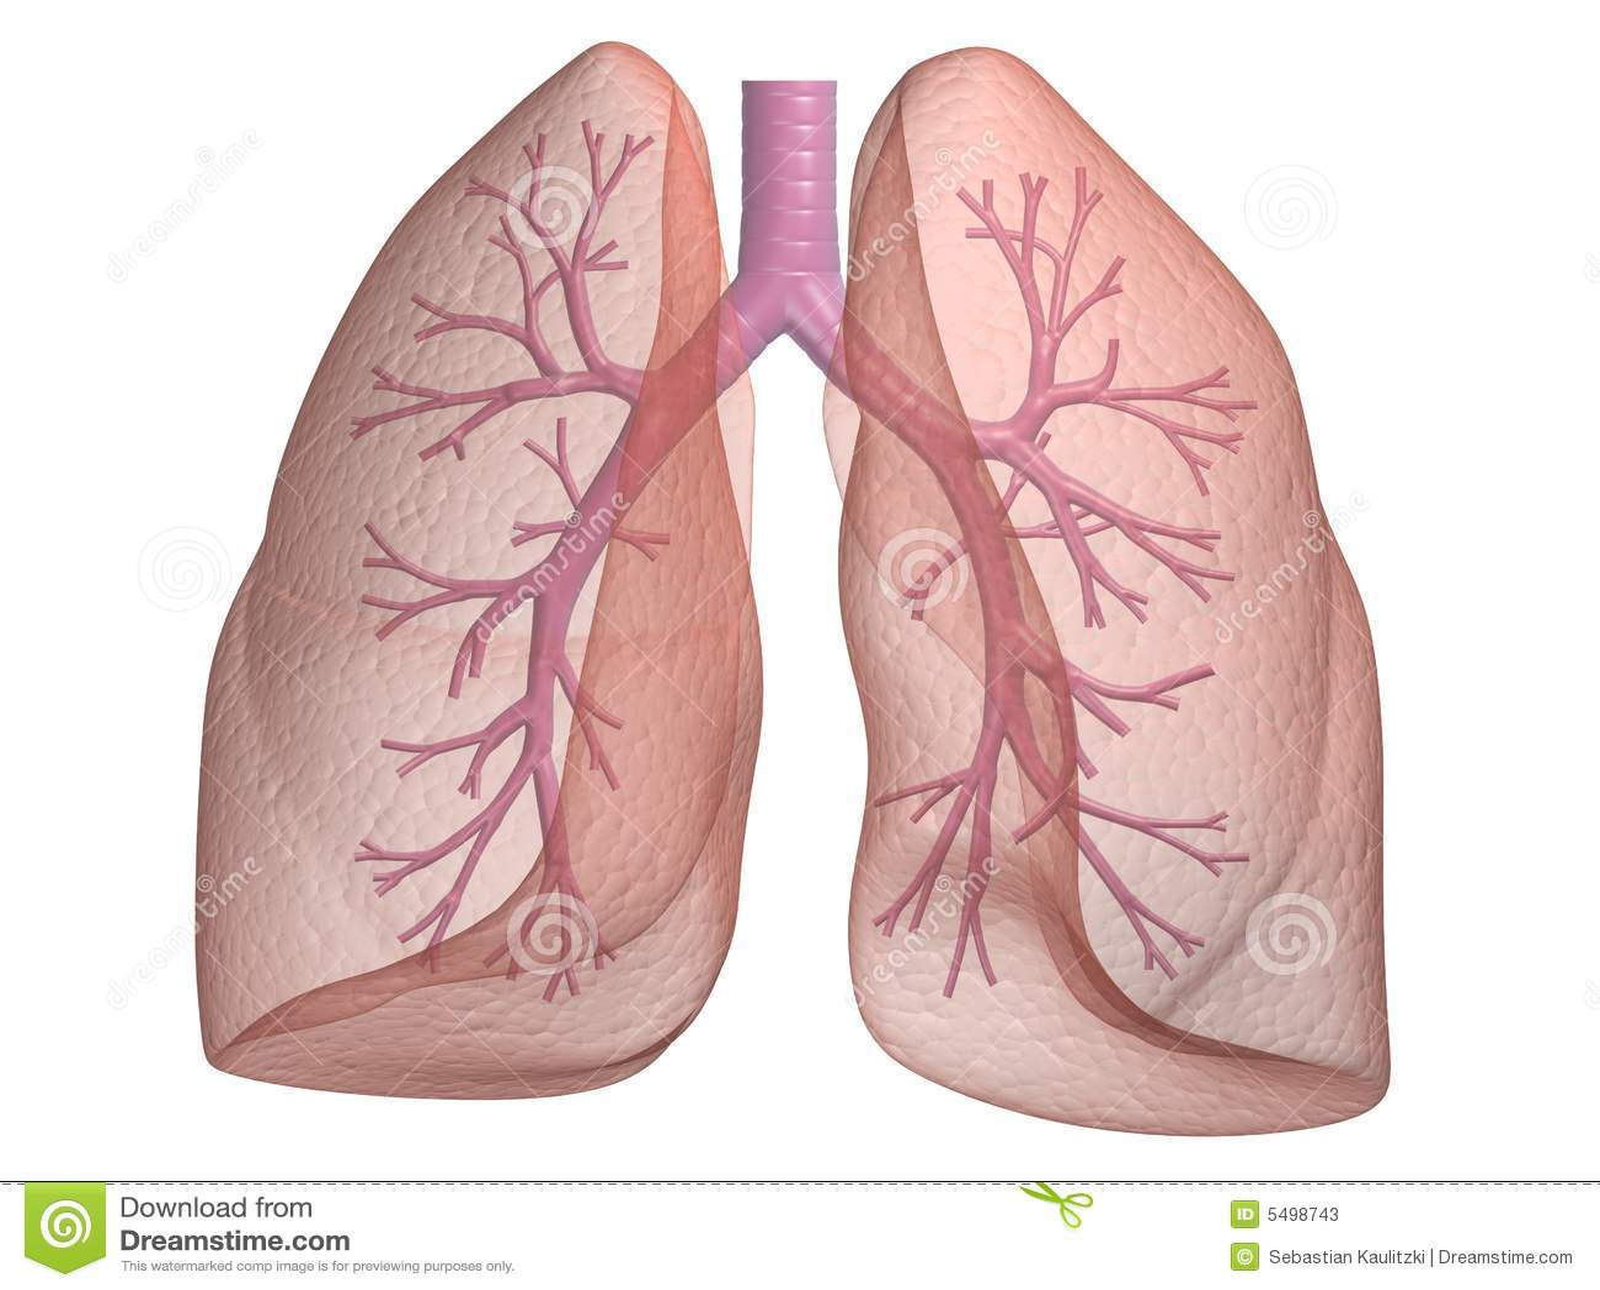 Long met bronchiën